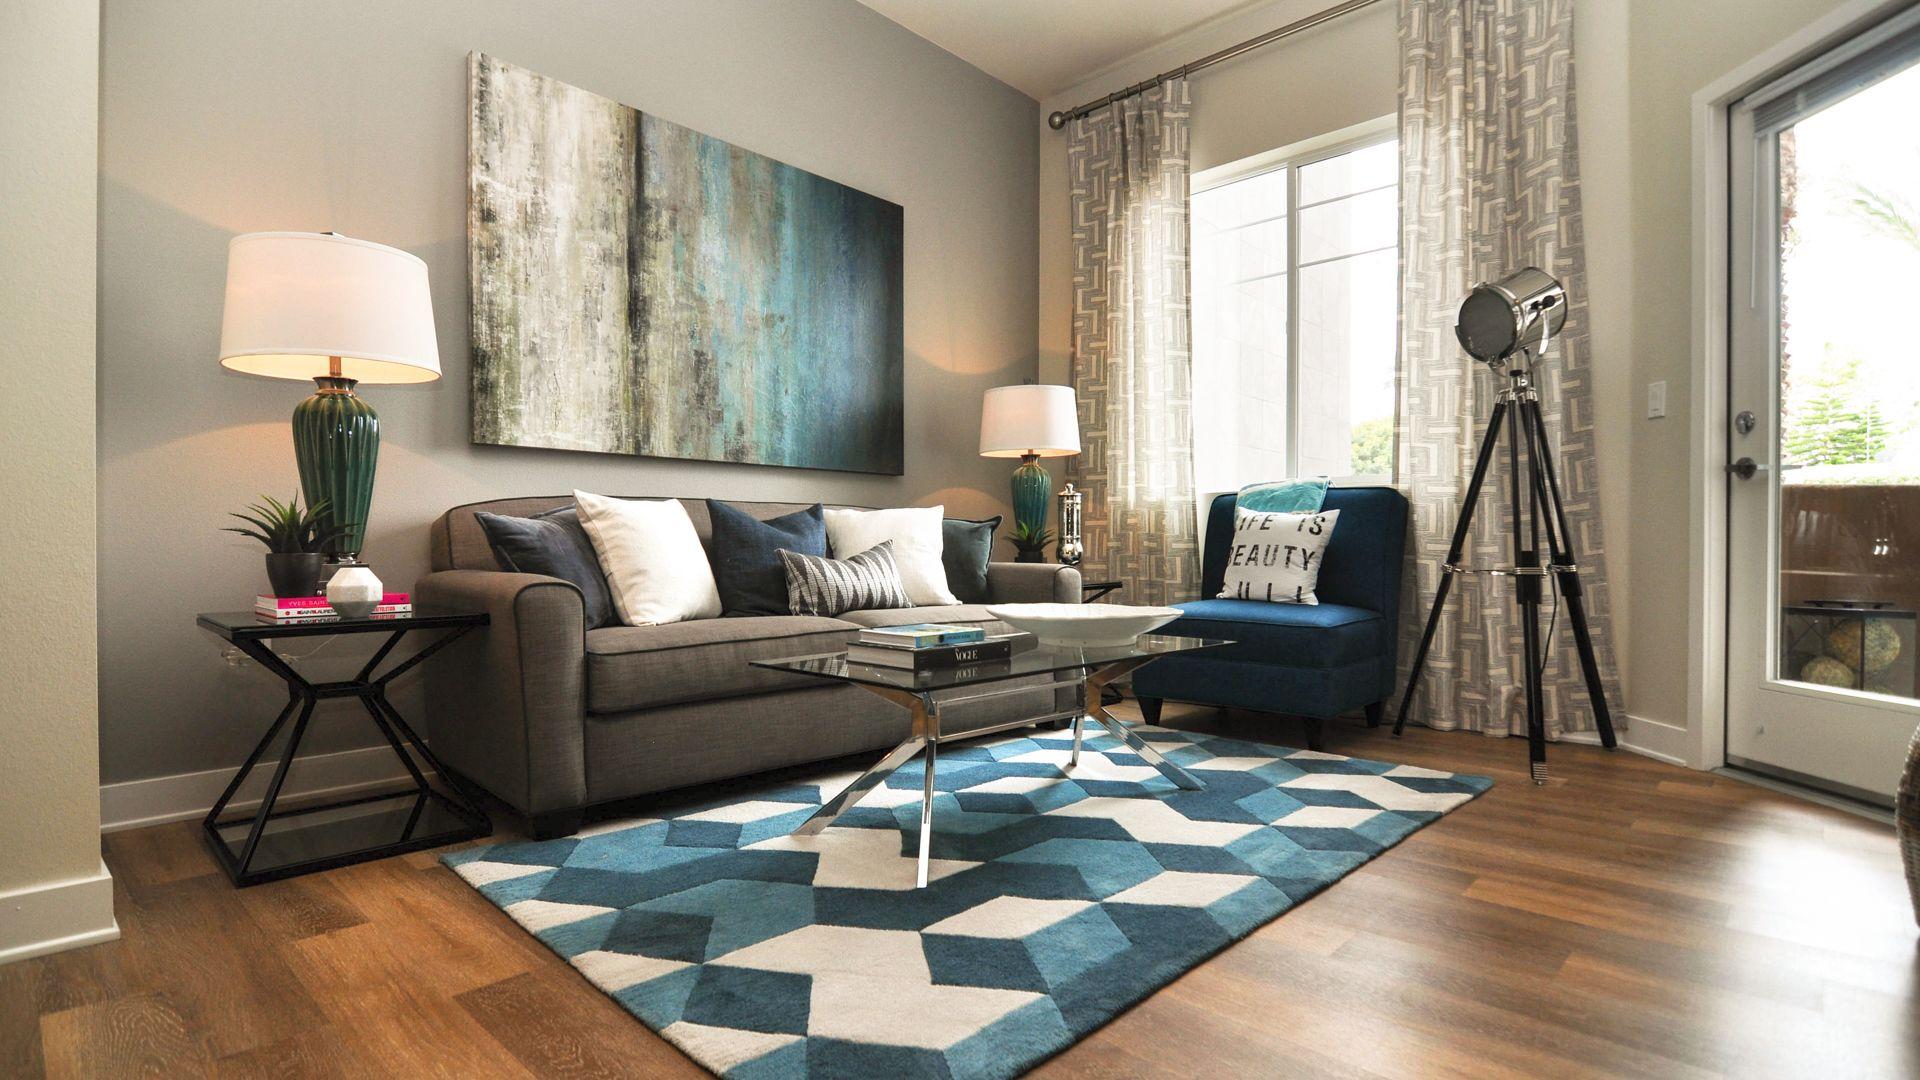 The kelvin apartments 2850 kelvin avenue - One bedroom apartment in orange county ...